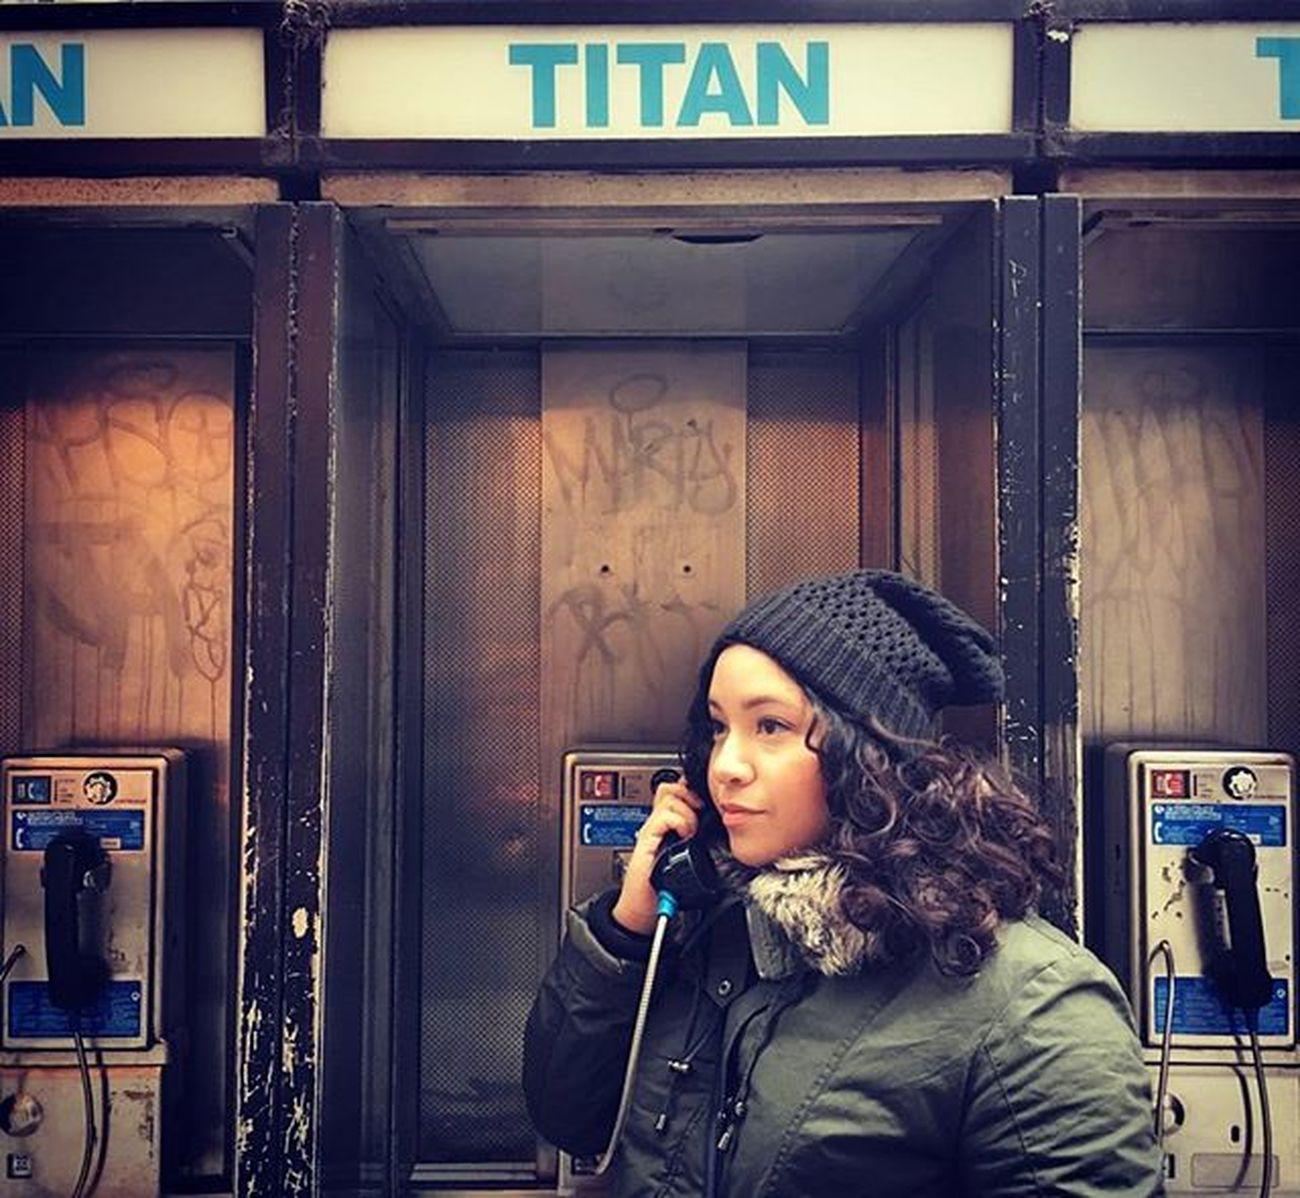 Phoning home. 📷: @kevinwayne.photography Igny Ignyc Newyorkcity NYC Illgrammers Shoot2kill Justgoshoot Instagood Peoplescreative Vscocam Vscogram Gameoftones Curlygirl Curlyhairkillas